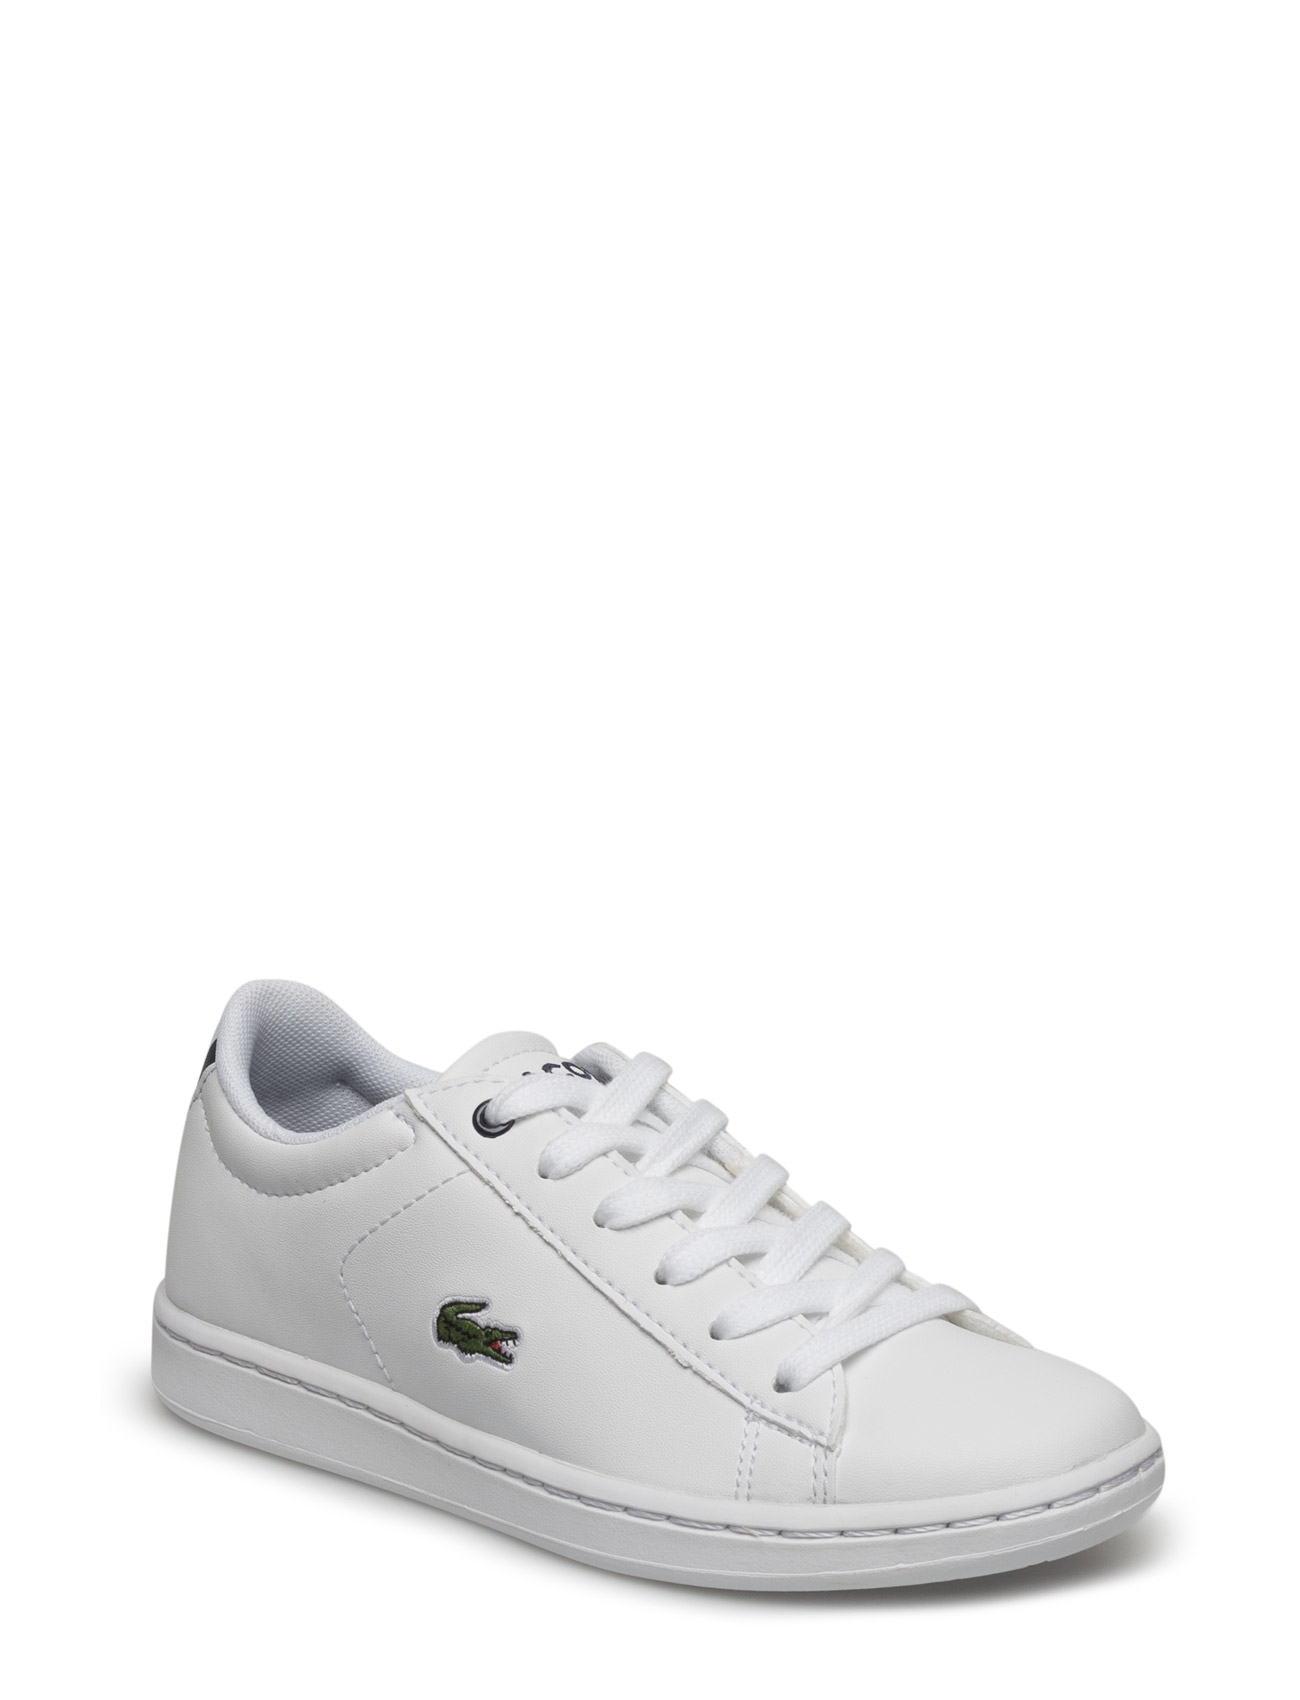 Carnaby evo bl 1 fra lacoste shoes på boozt.com dk